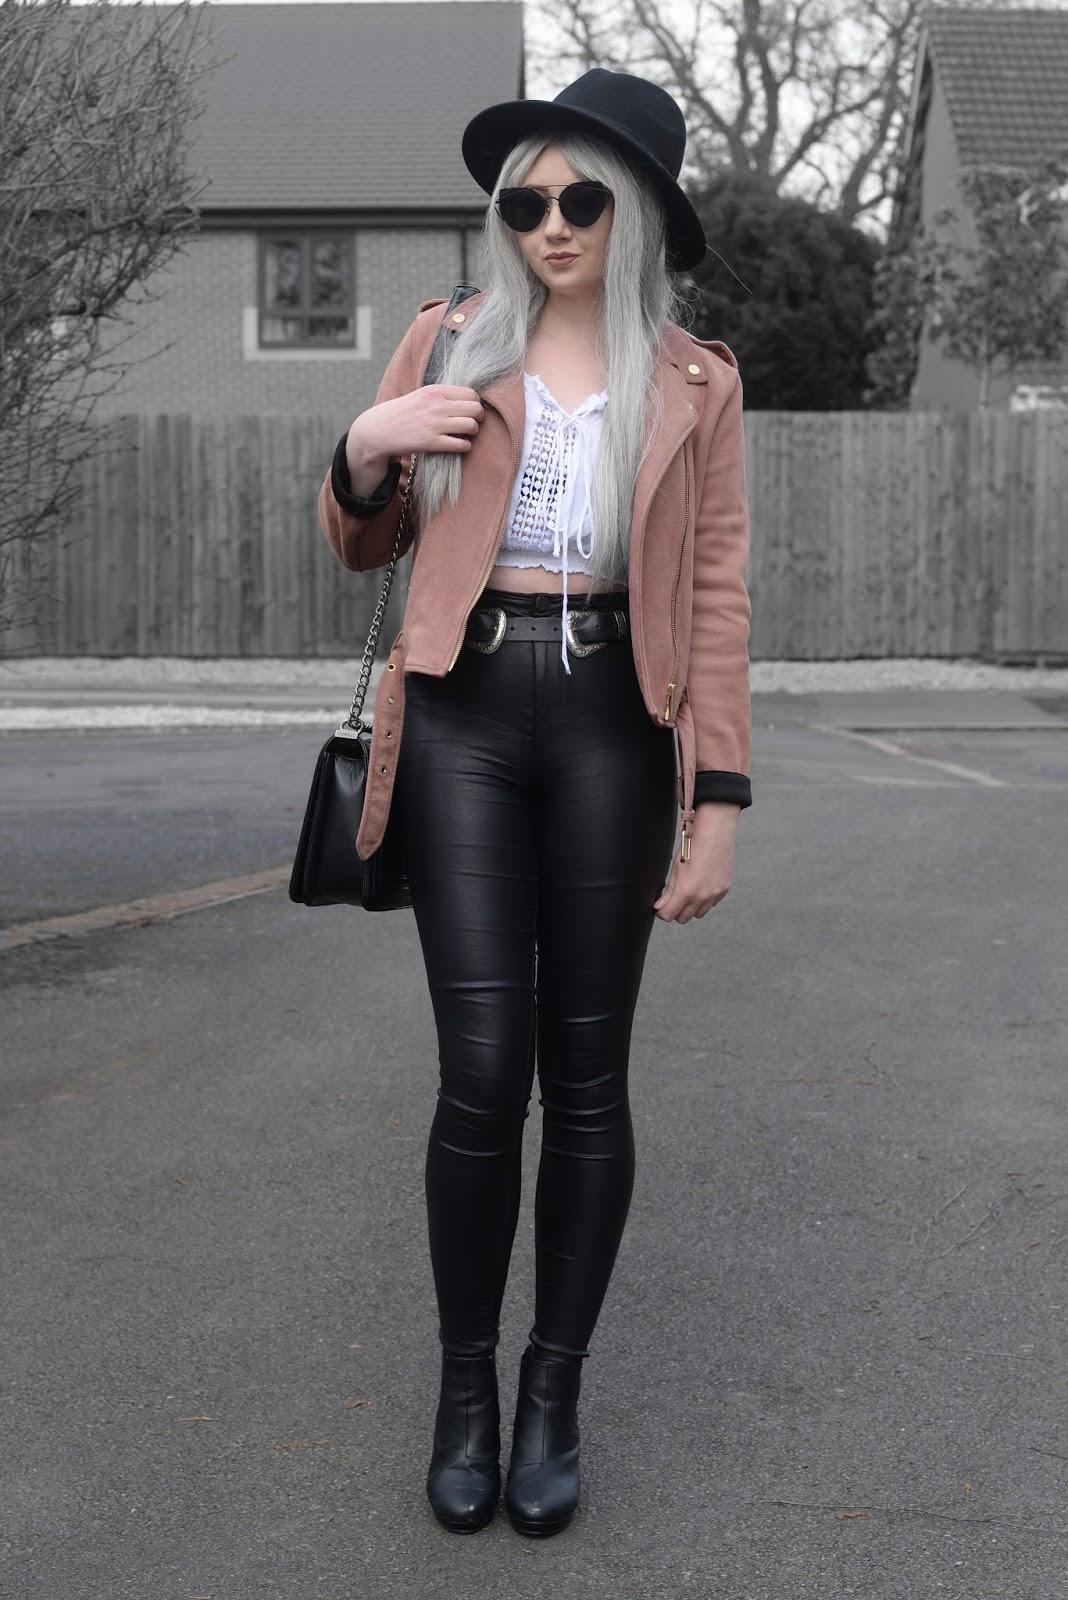 f0d8eb8a6a Sammi Jackson - Black Primark Fedora / Zaful Sunglasses / Primark Pink  Suede Biker Jacket /